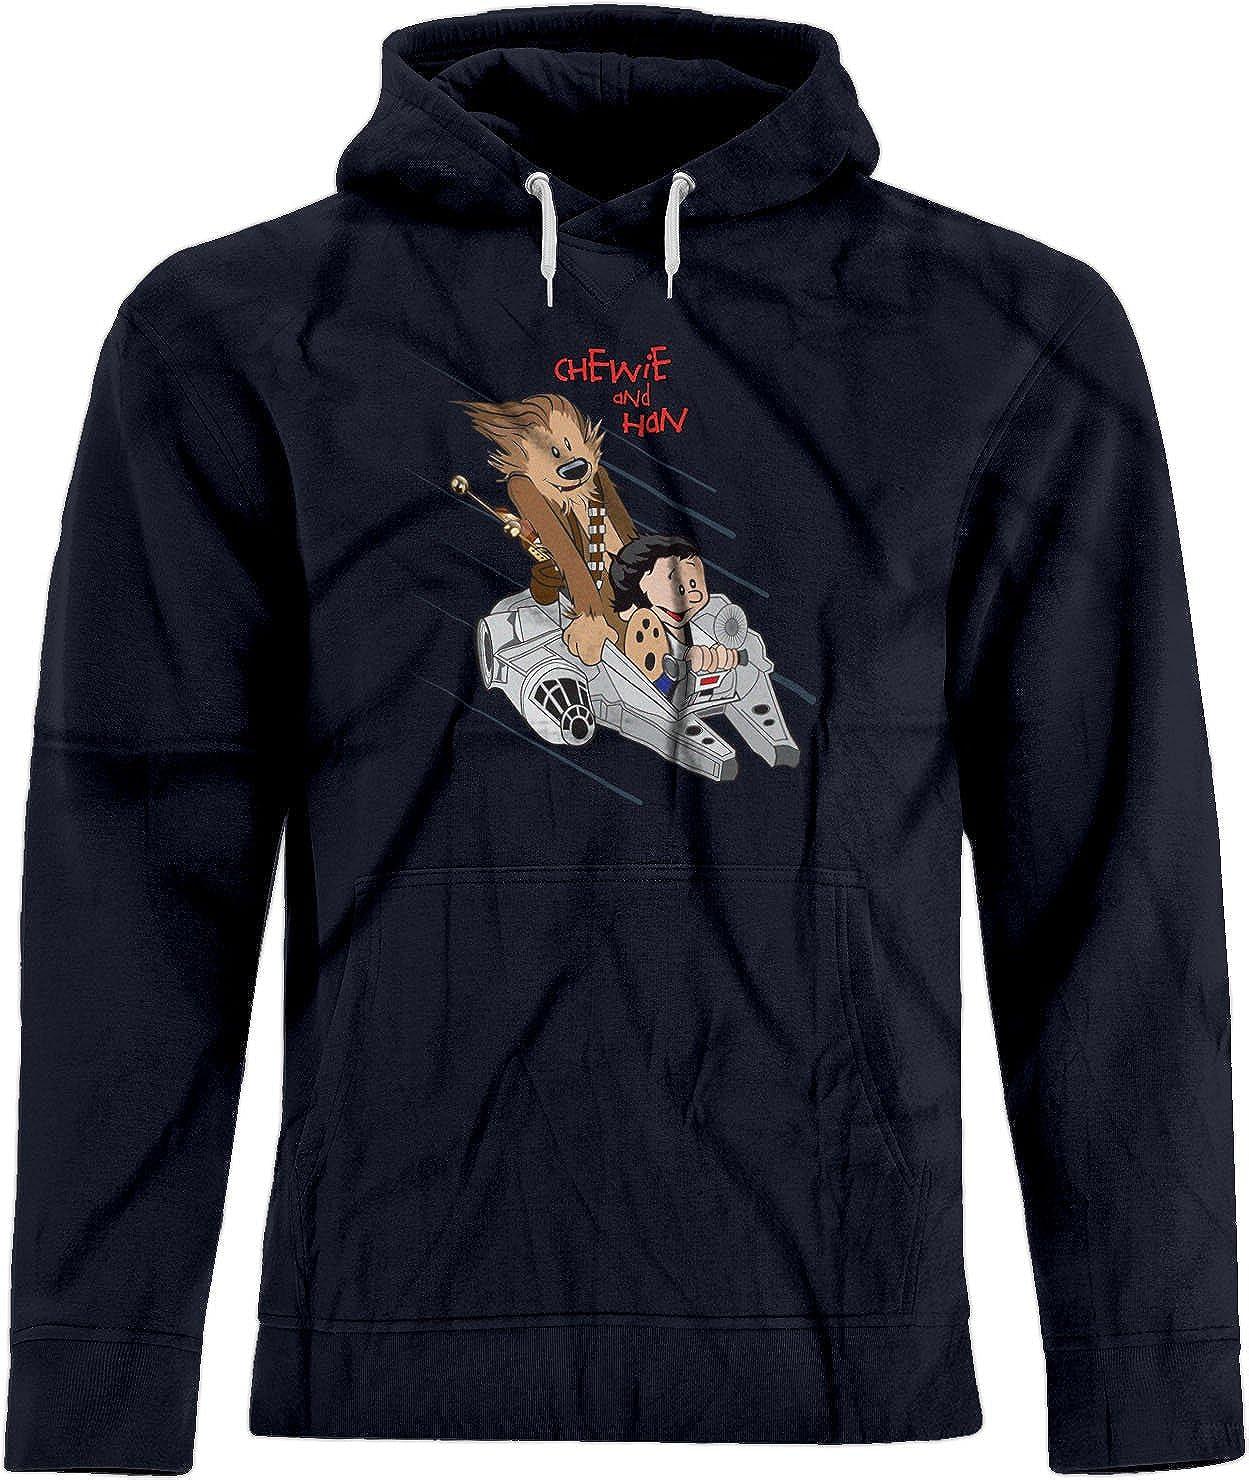 Amazon.com: BSW Unisex Chewie & Han Calvin & Hobbes Falcon Star Wars Premium Hoodie: Clothing